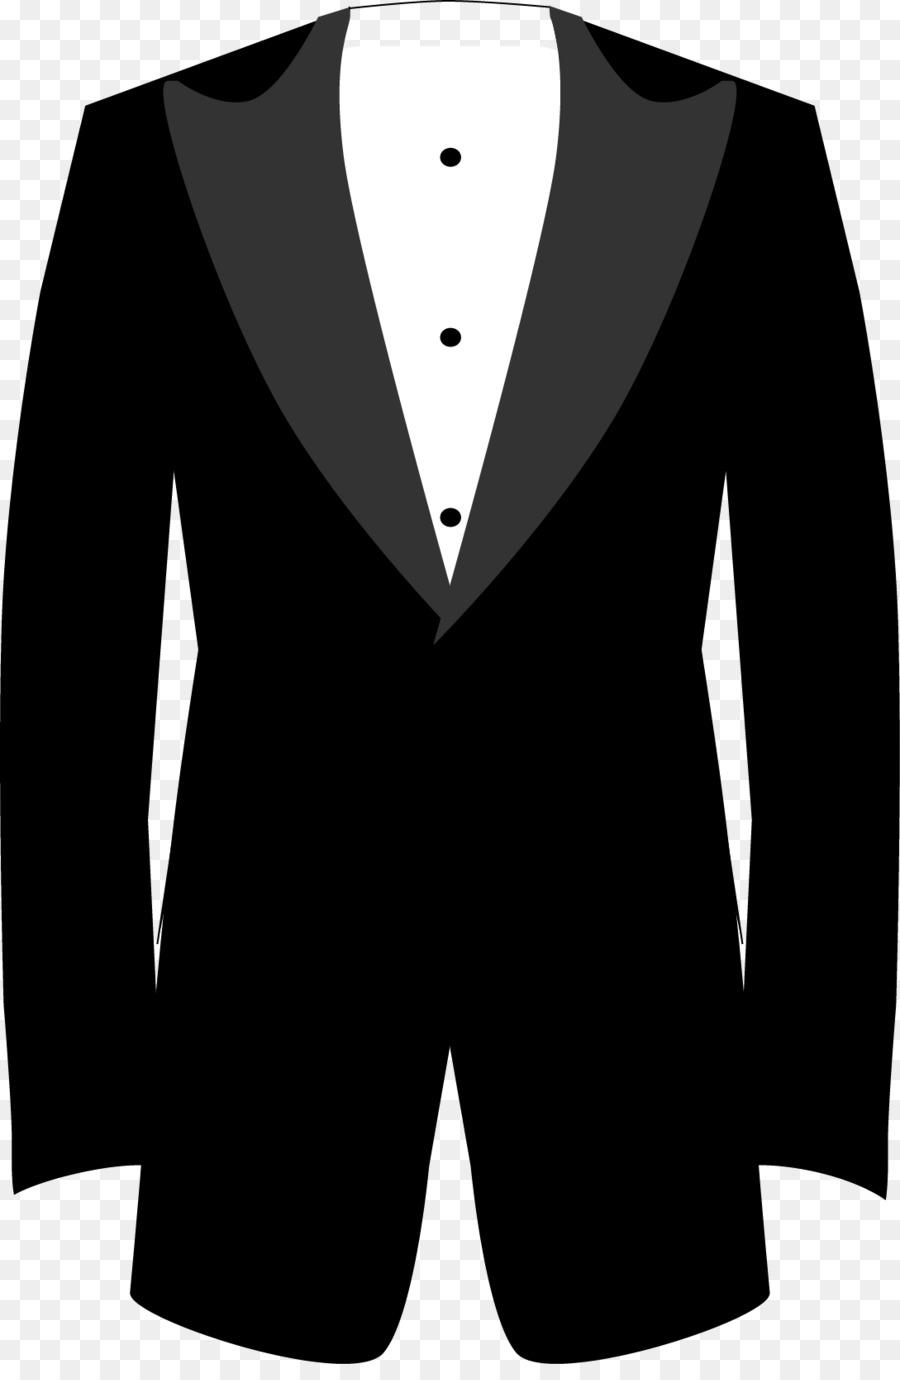 t shirt tuxedo bow tie clip art vector suit png download 1089 rh kisspng com shirt and tie clipart